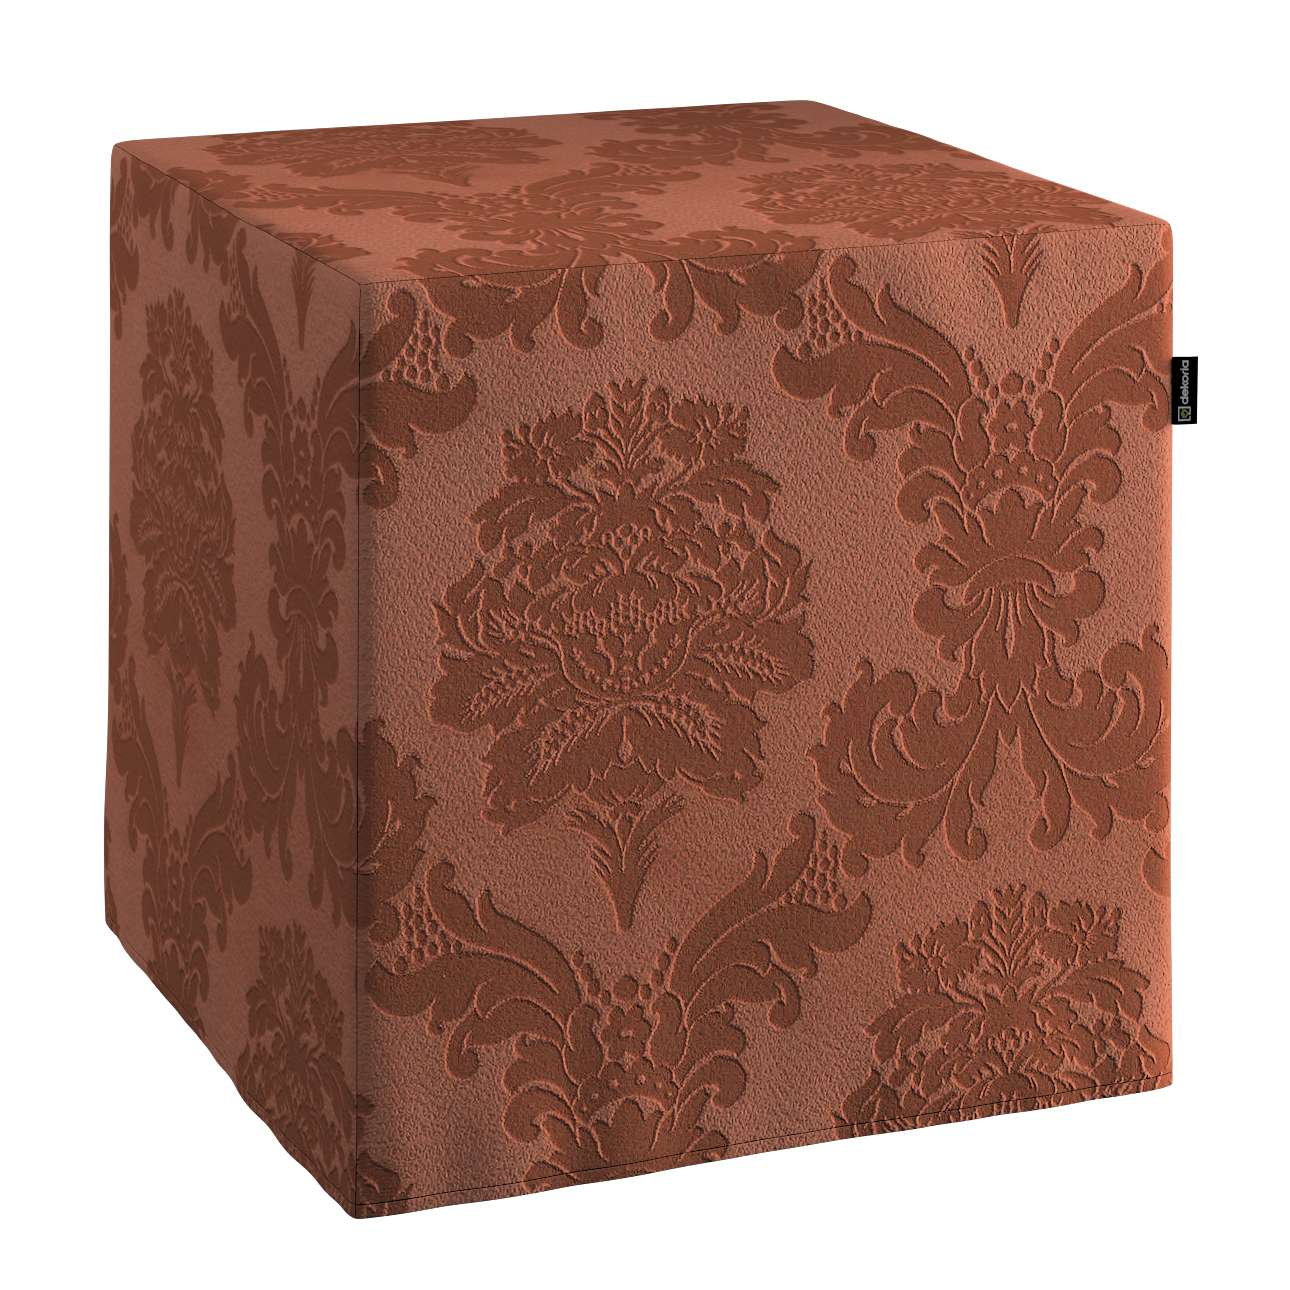 Sedák Cube - kostka pevná 40x40x40 v kolekci Damasco, látka: 613-88